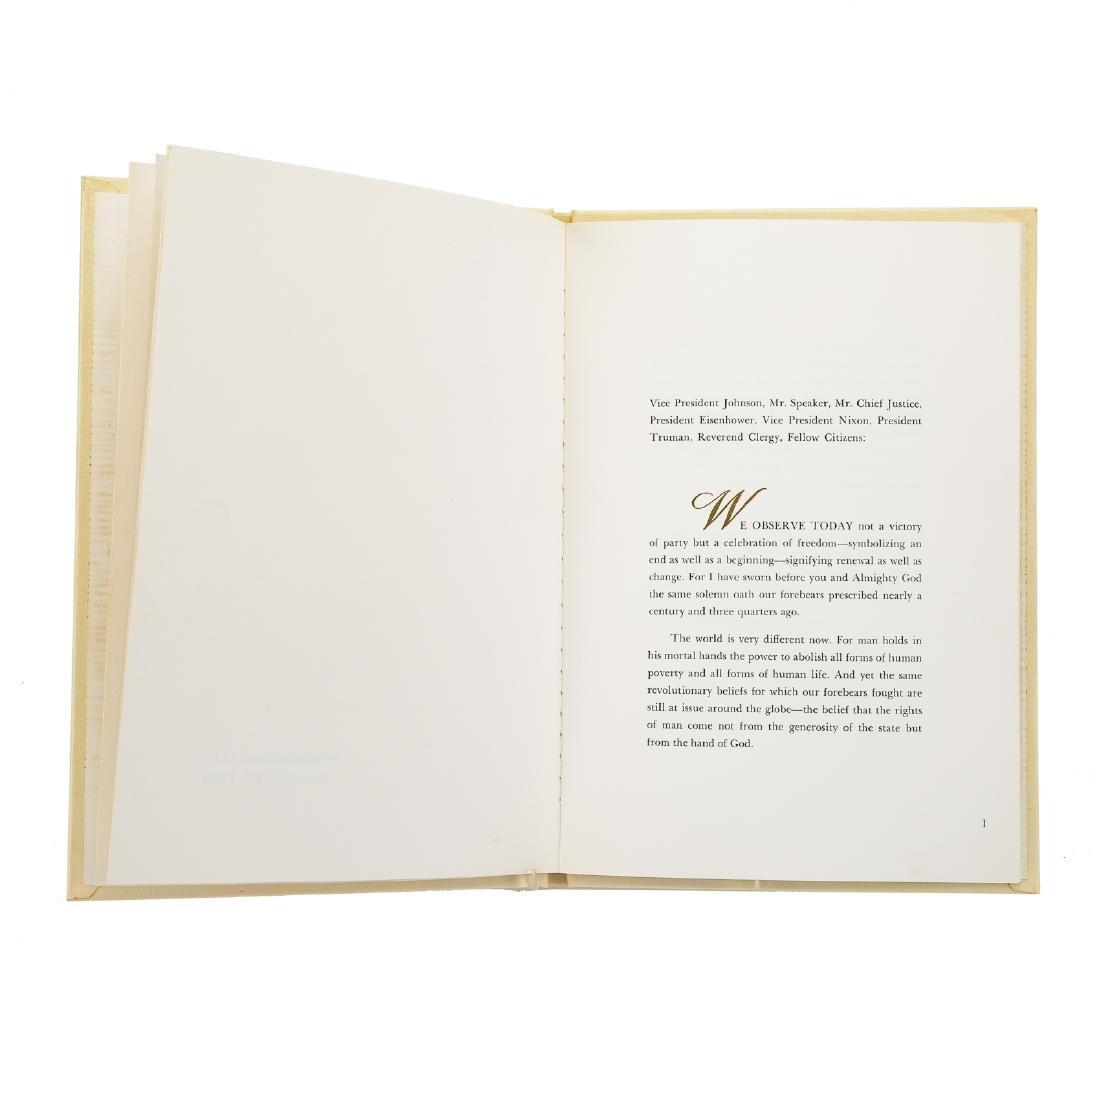 Inaugural Address of John F. Kennedy - 6